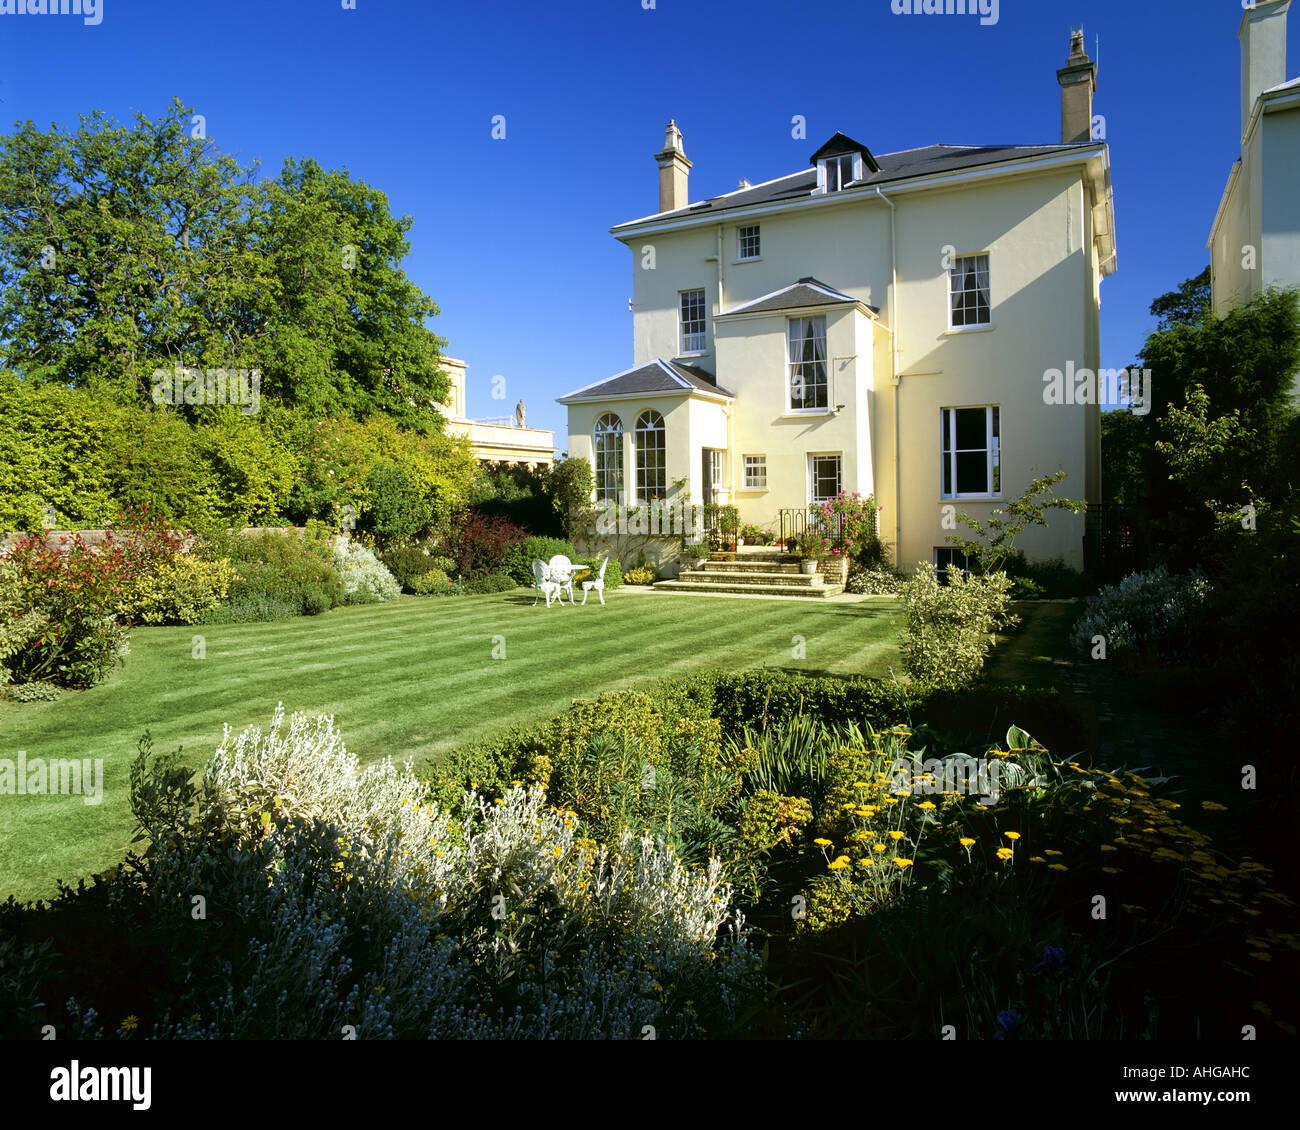 Go - GLOUCESTERSHIRE: Parkgate Villa dans Cheltenham Photo Stock